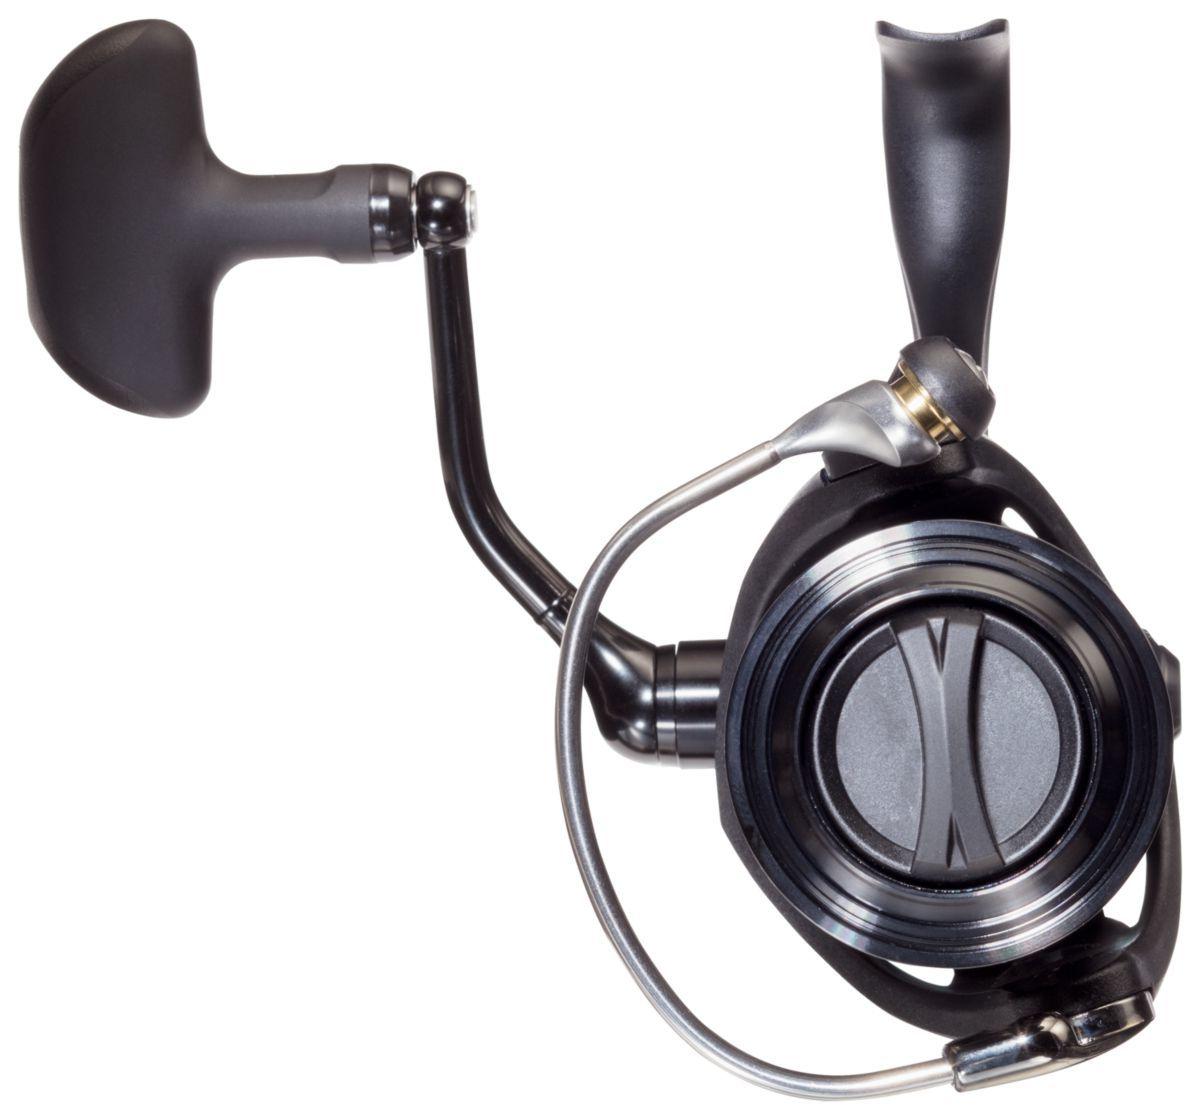 Daiwa® Saltist® Back Bay LT Spinning Reel